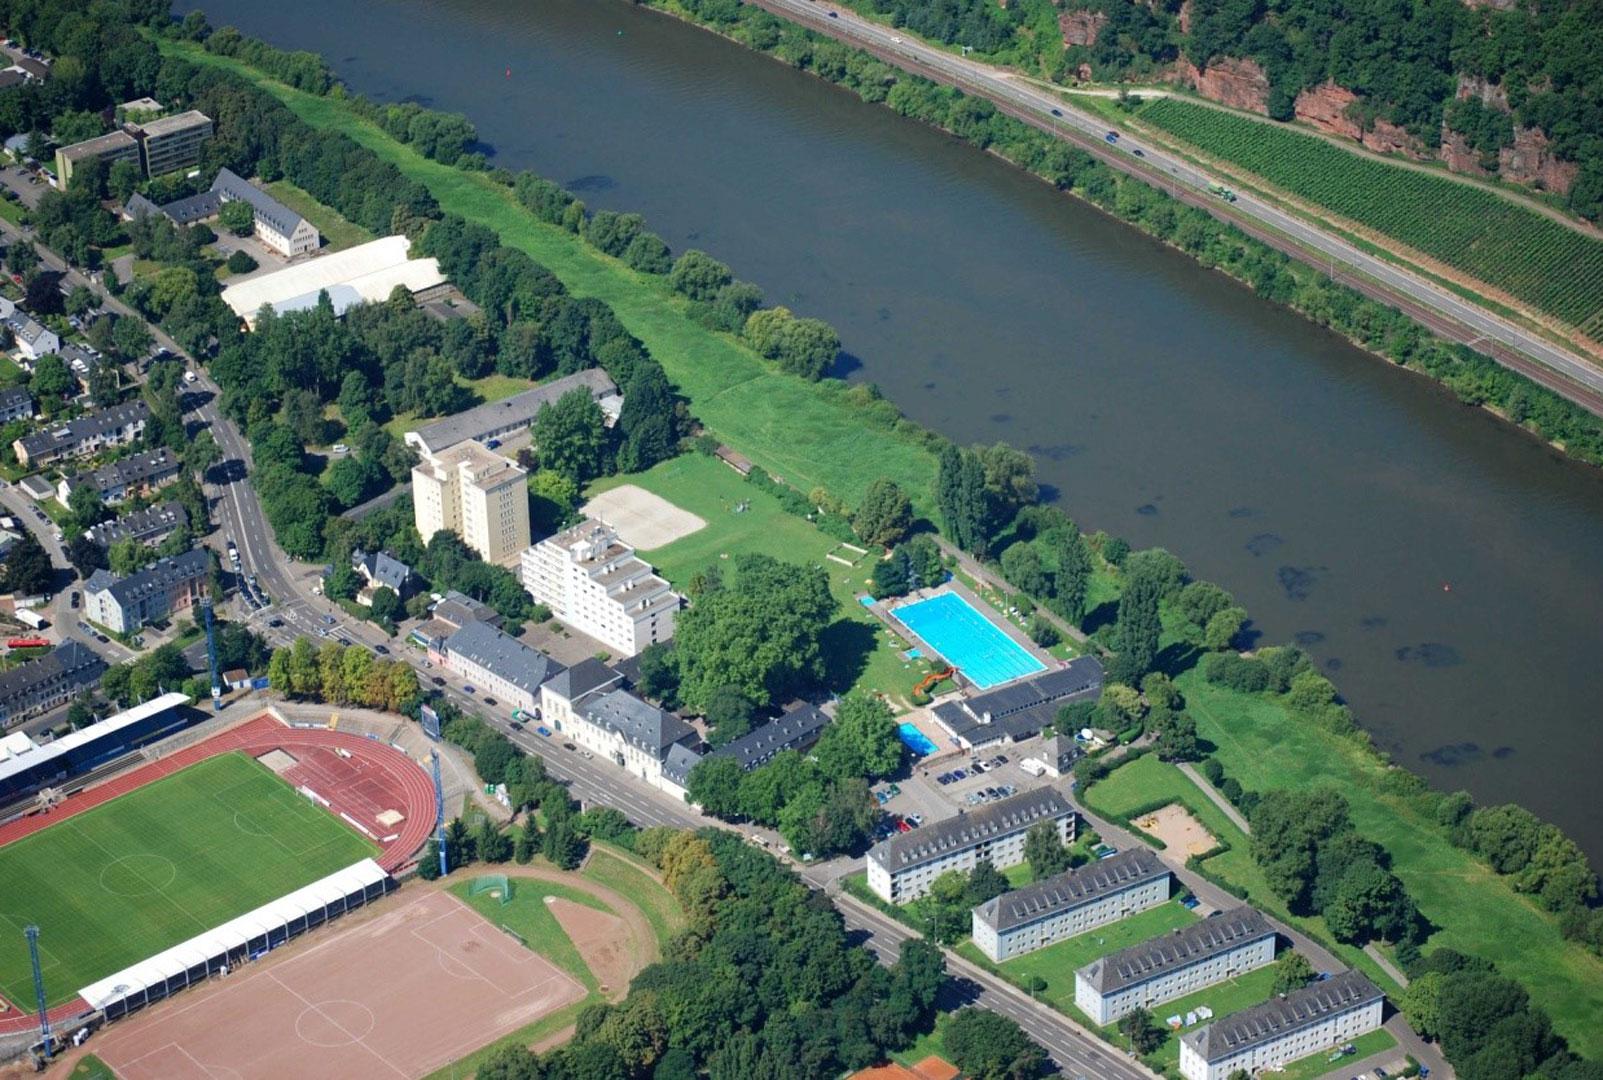 Bauabschnitt 2 Nordbad Stadion Luftbild